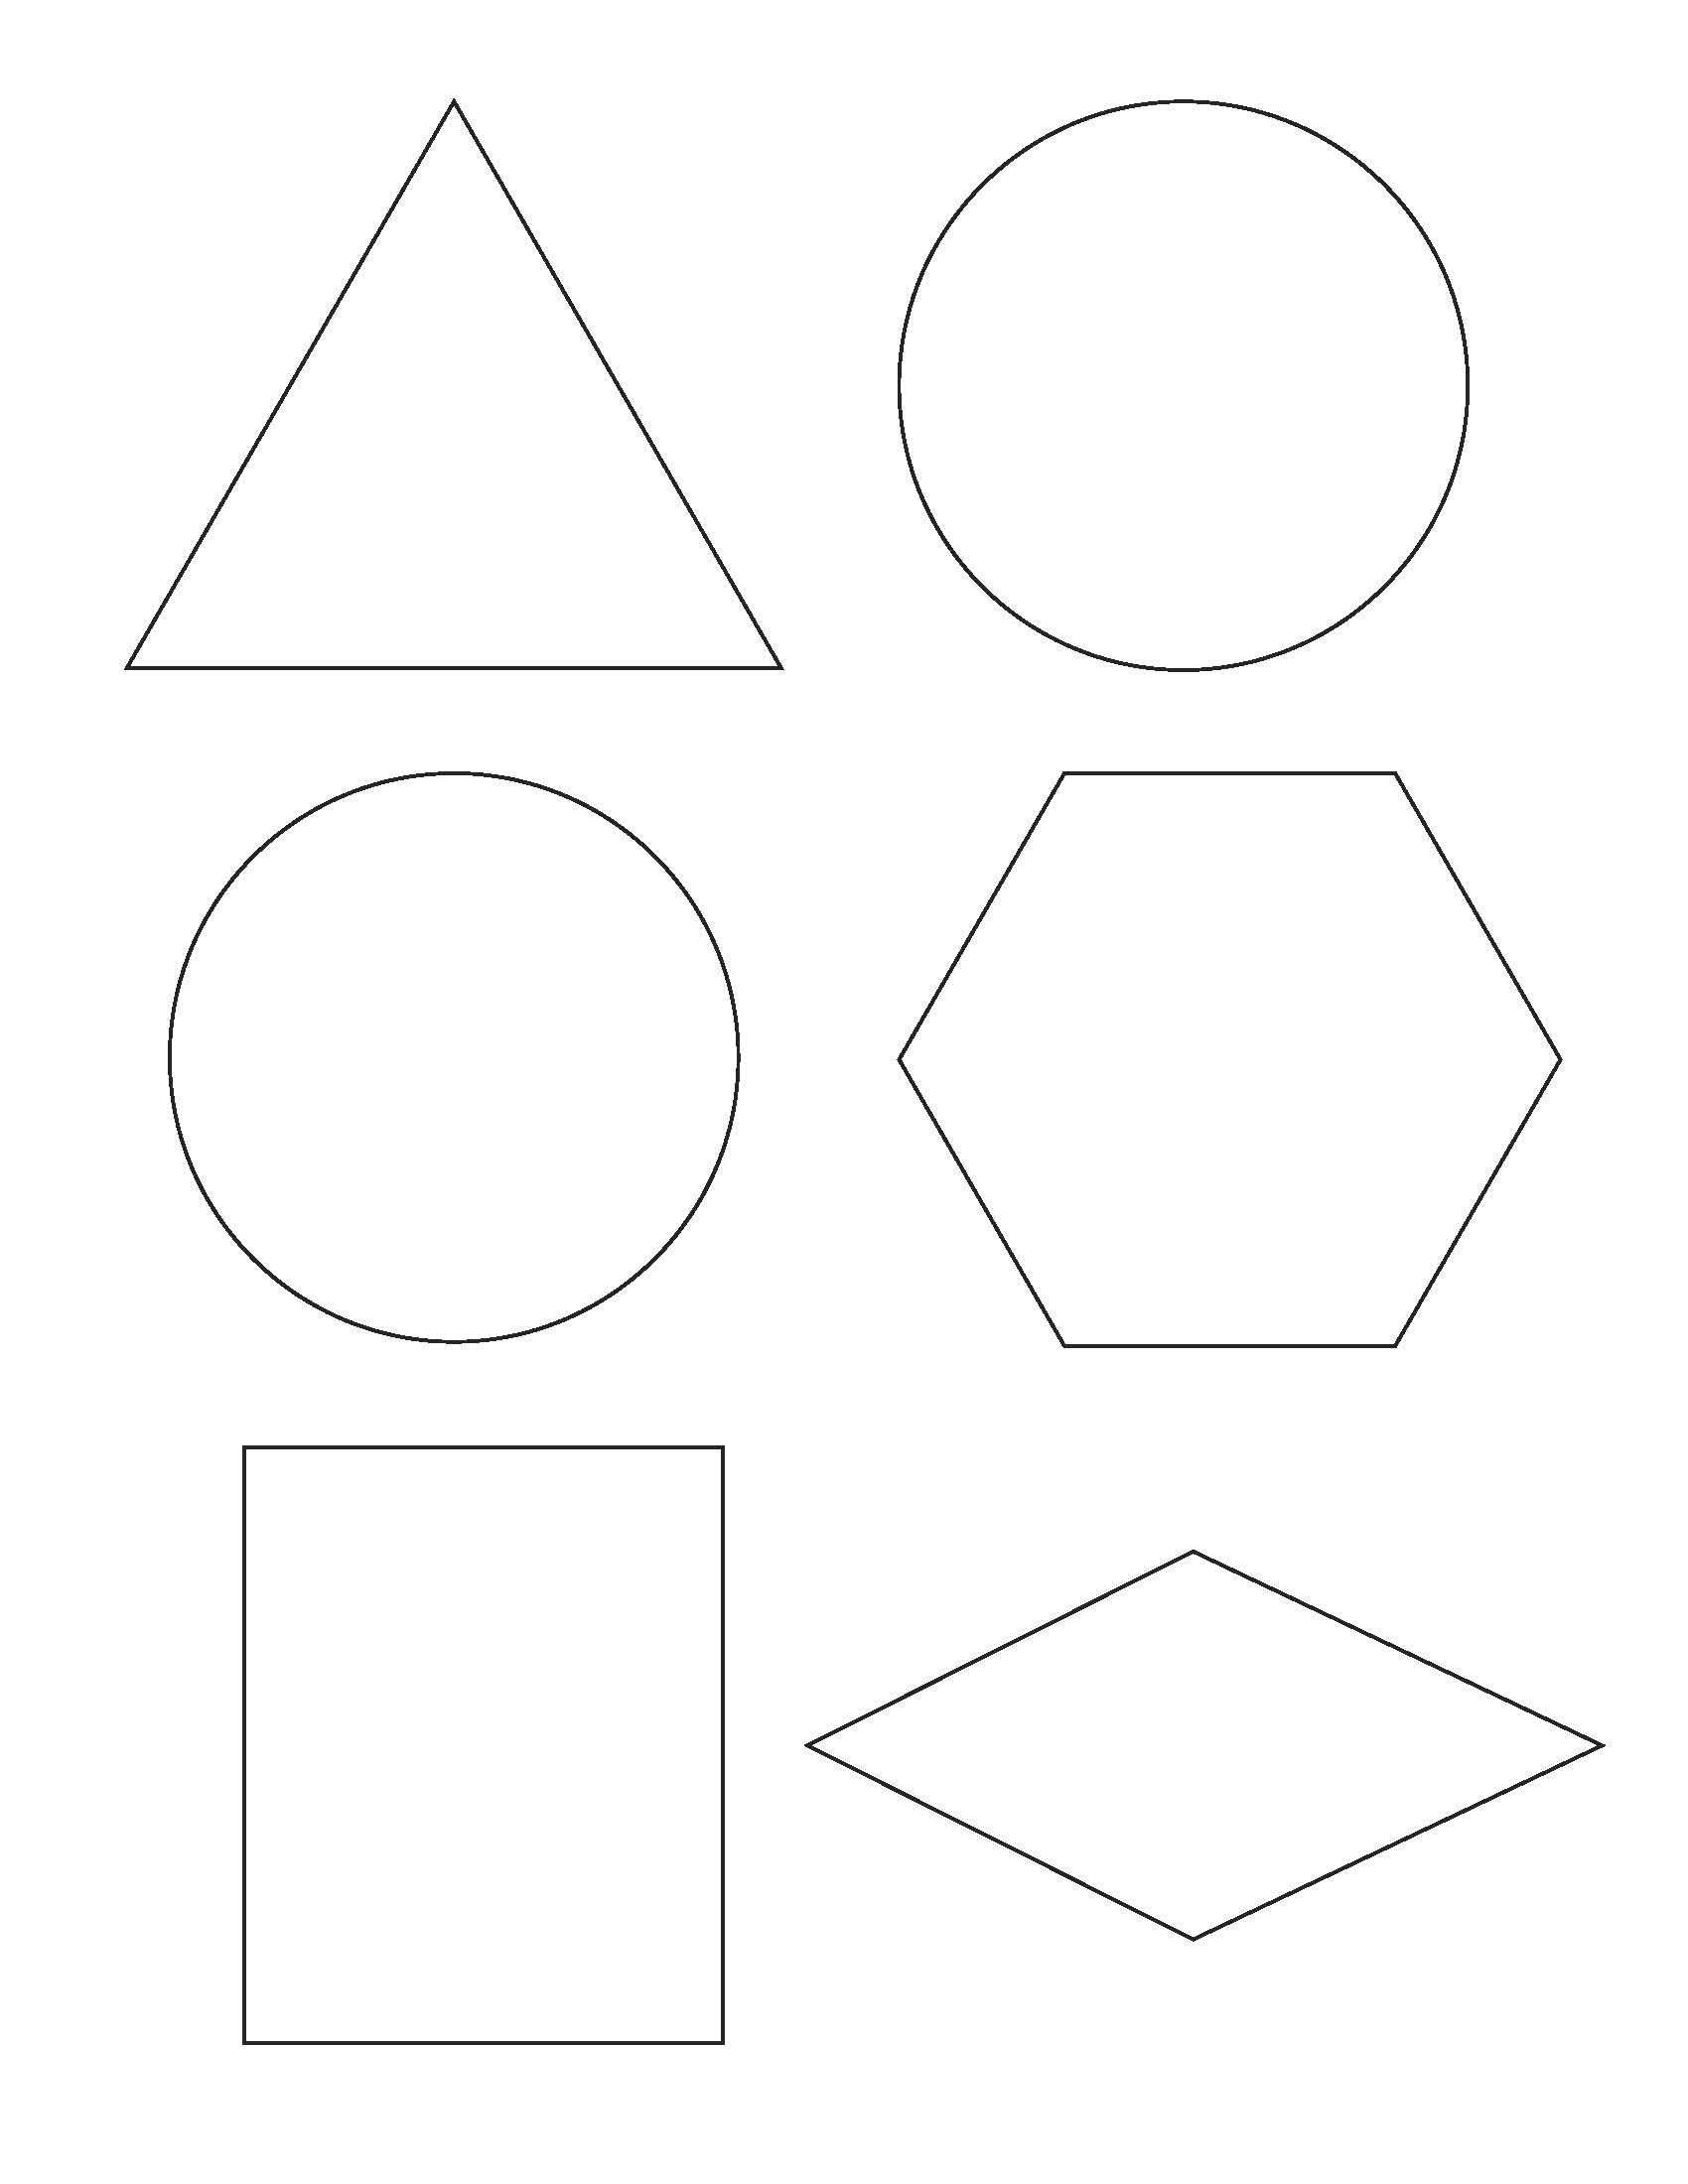 Free Printable Shapes Templates – Pazzo - Free Printable Shapes Templates